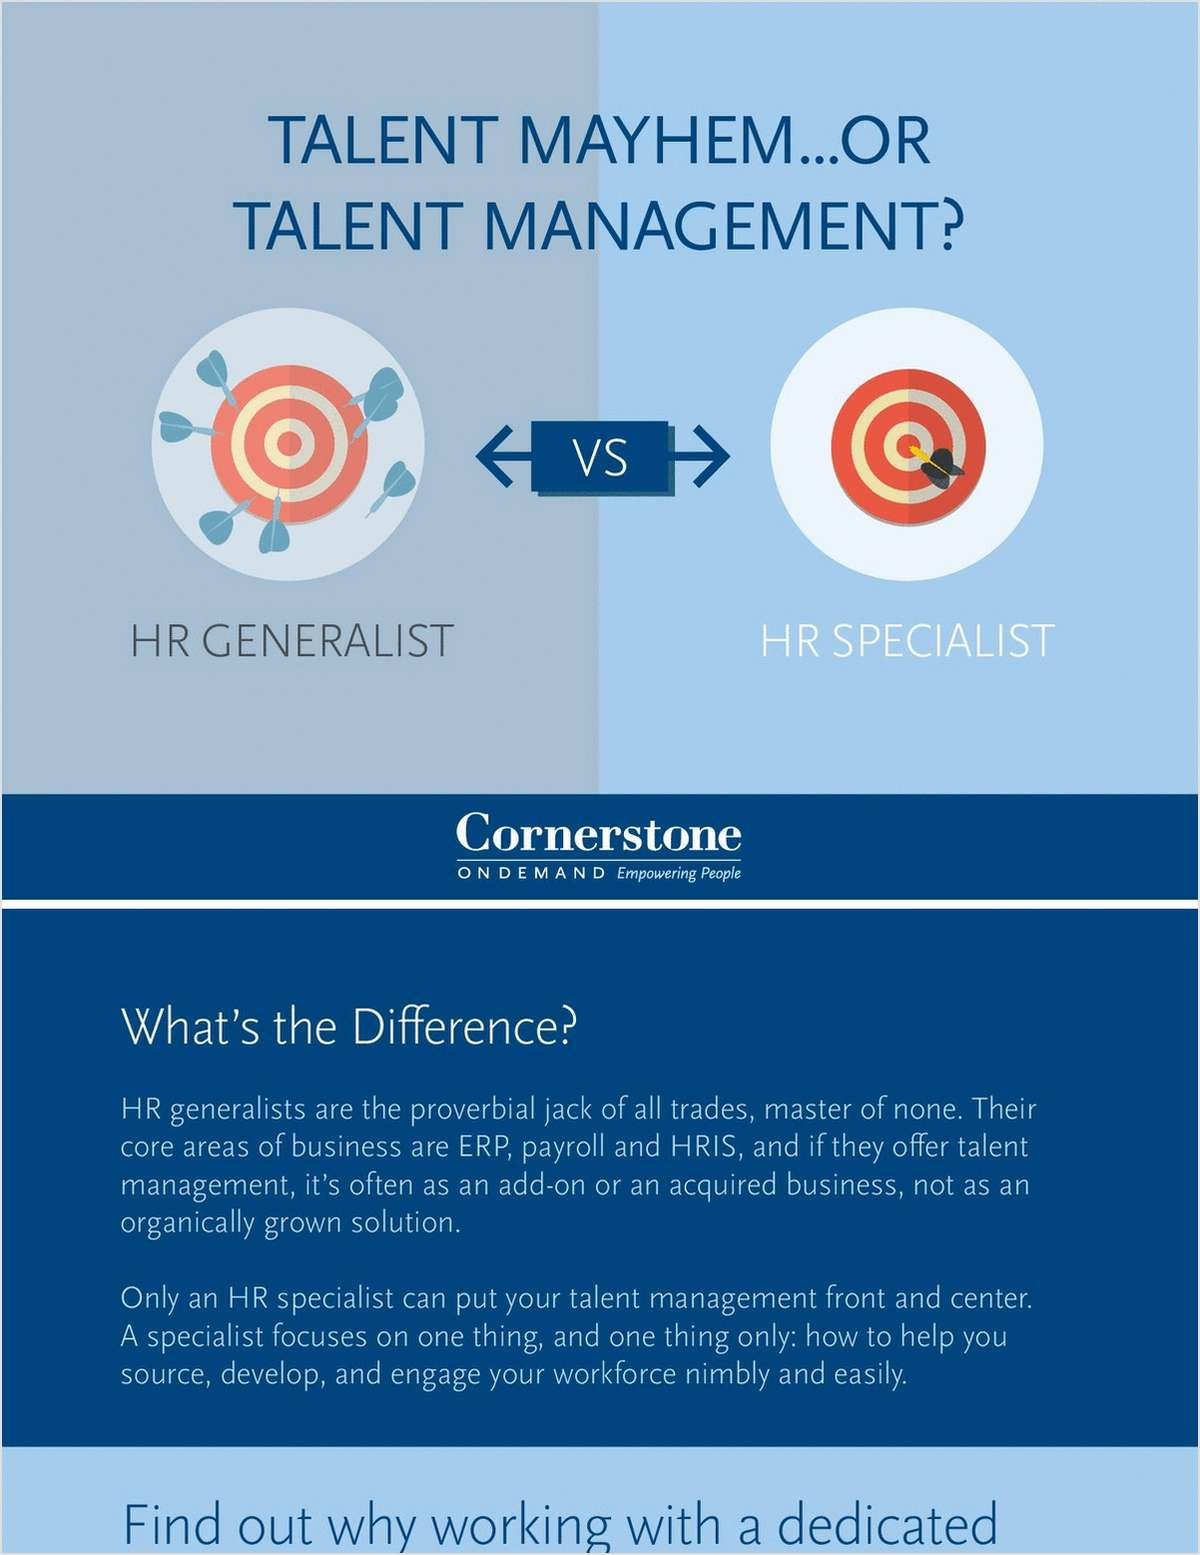 Talent Mayhem…OR Talent Management?